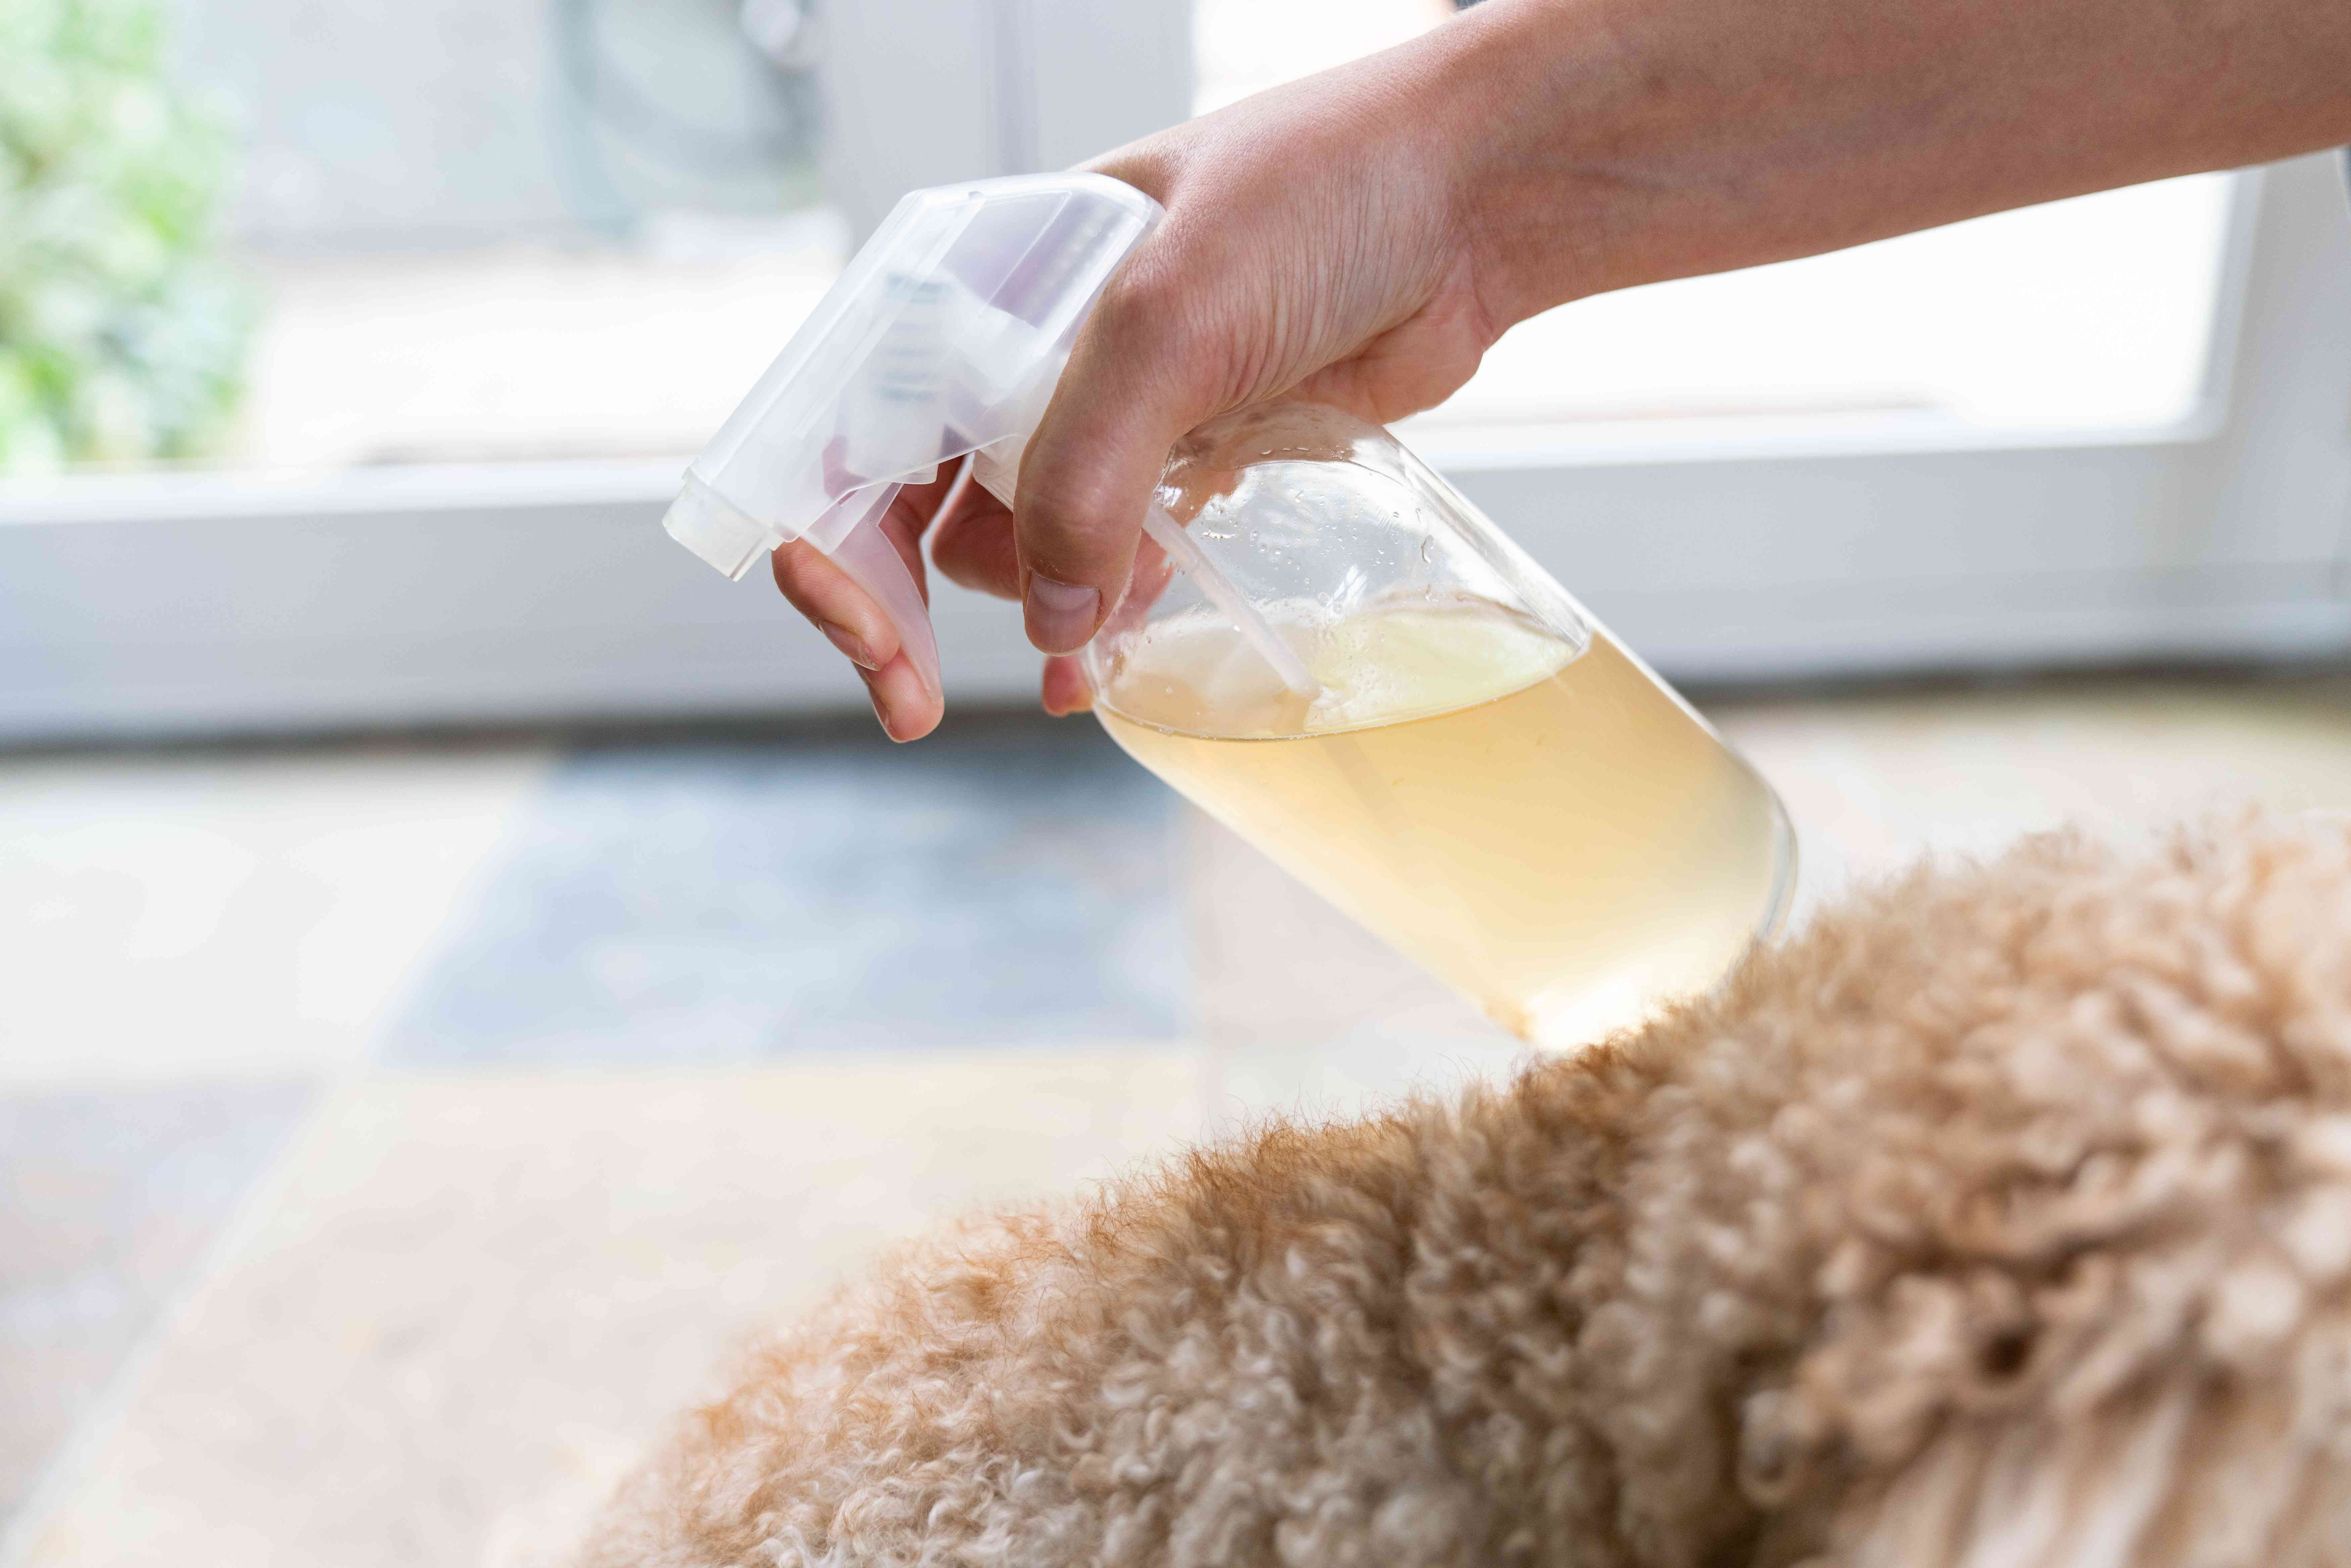 spraying apple cider vinegar solution onto an itchy dog